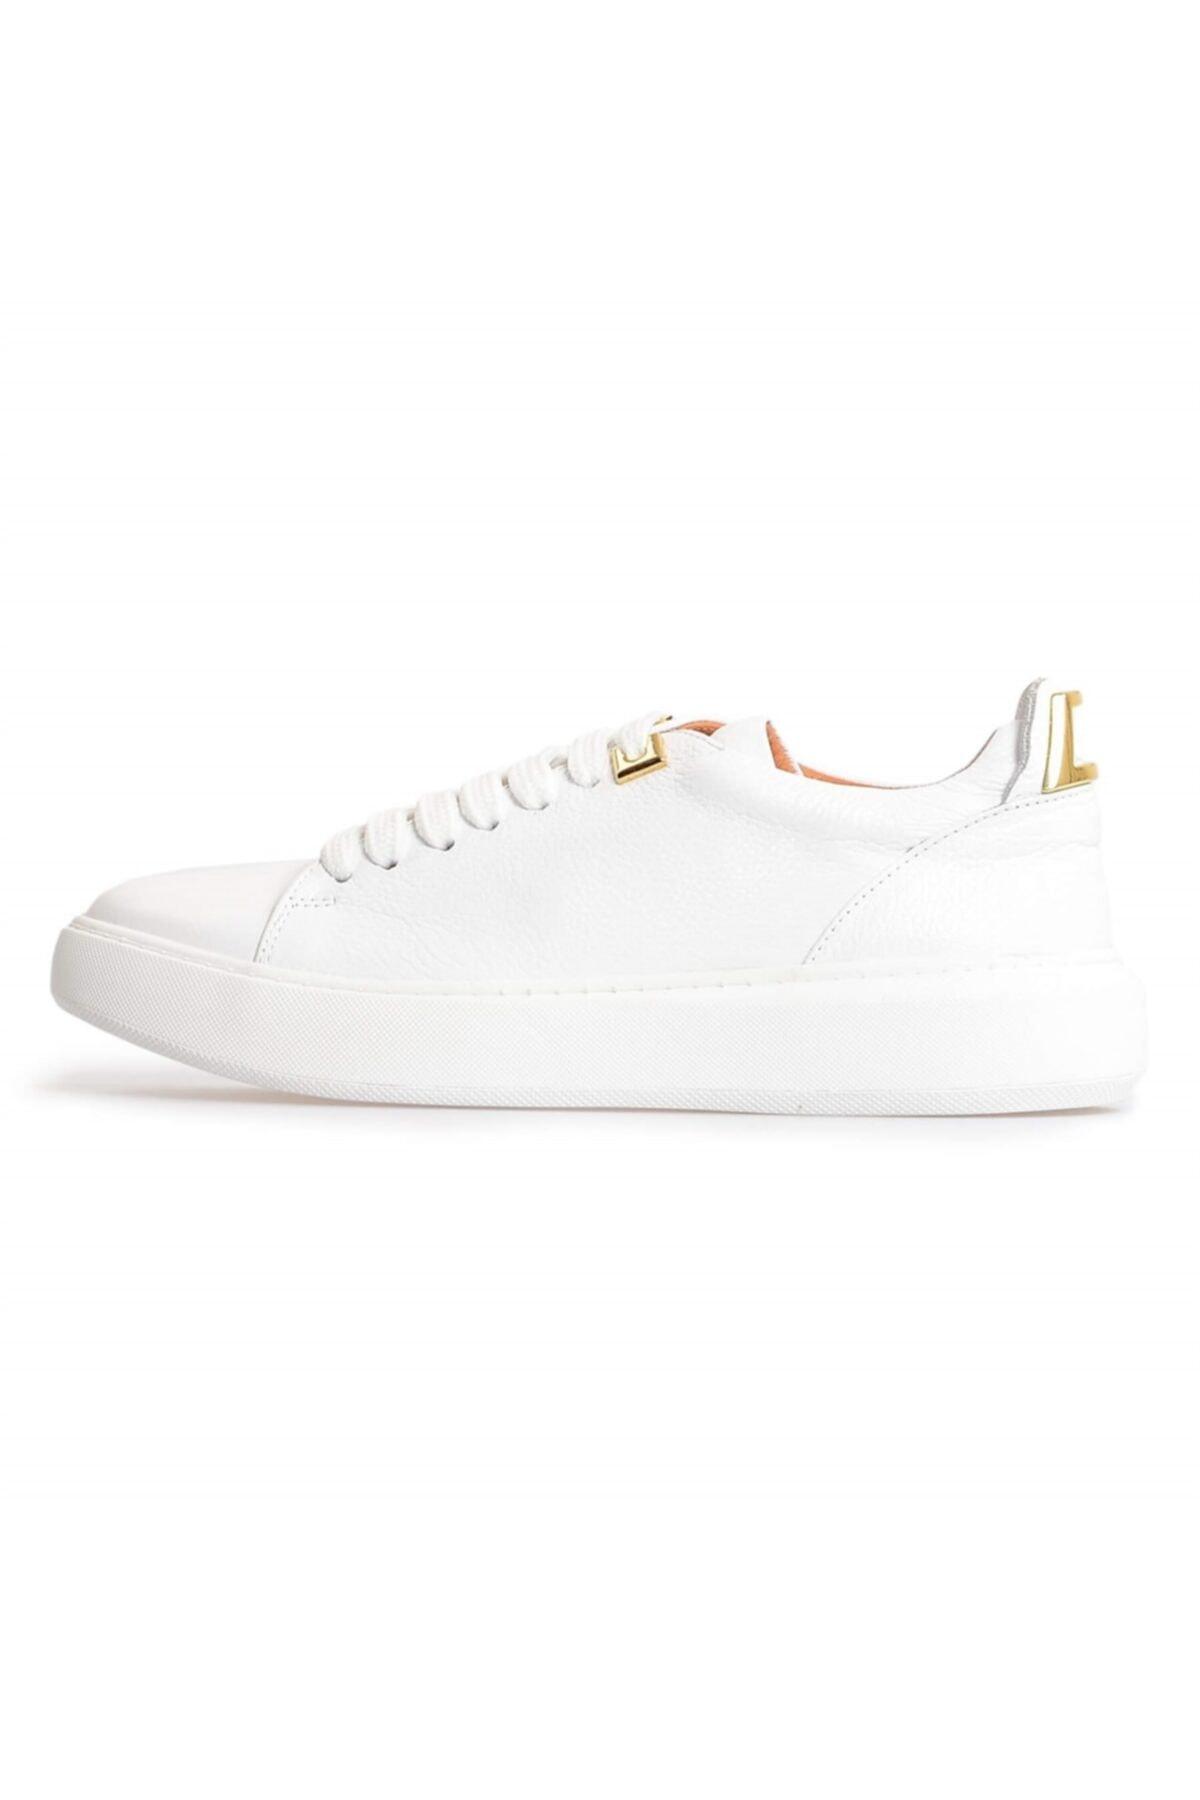 Flower Beyaz Deri Gold Toka Detaylı Sneakers 1